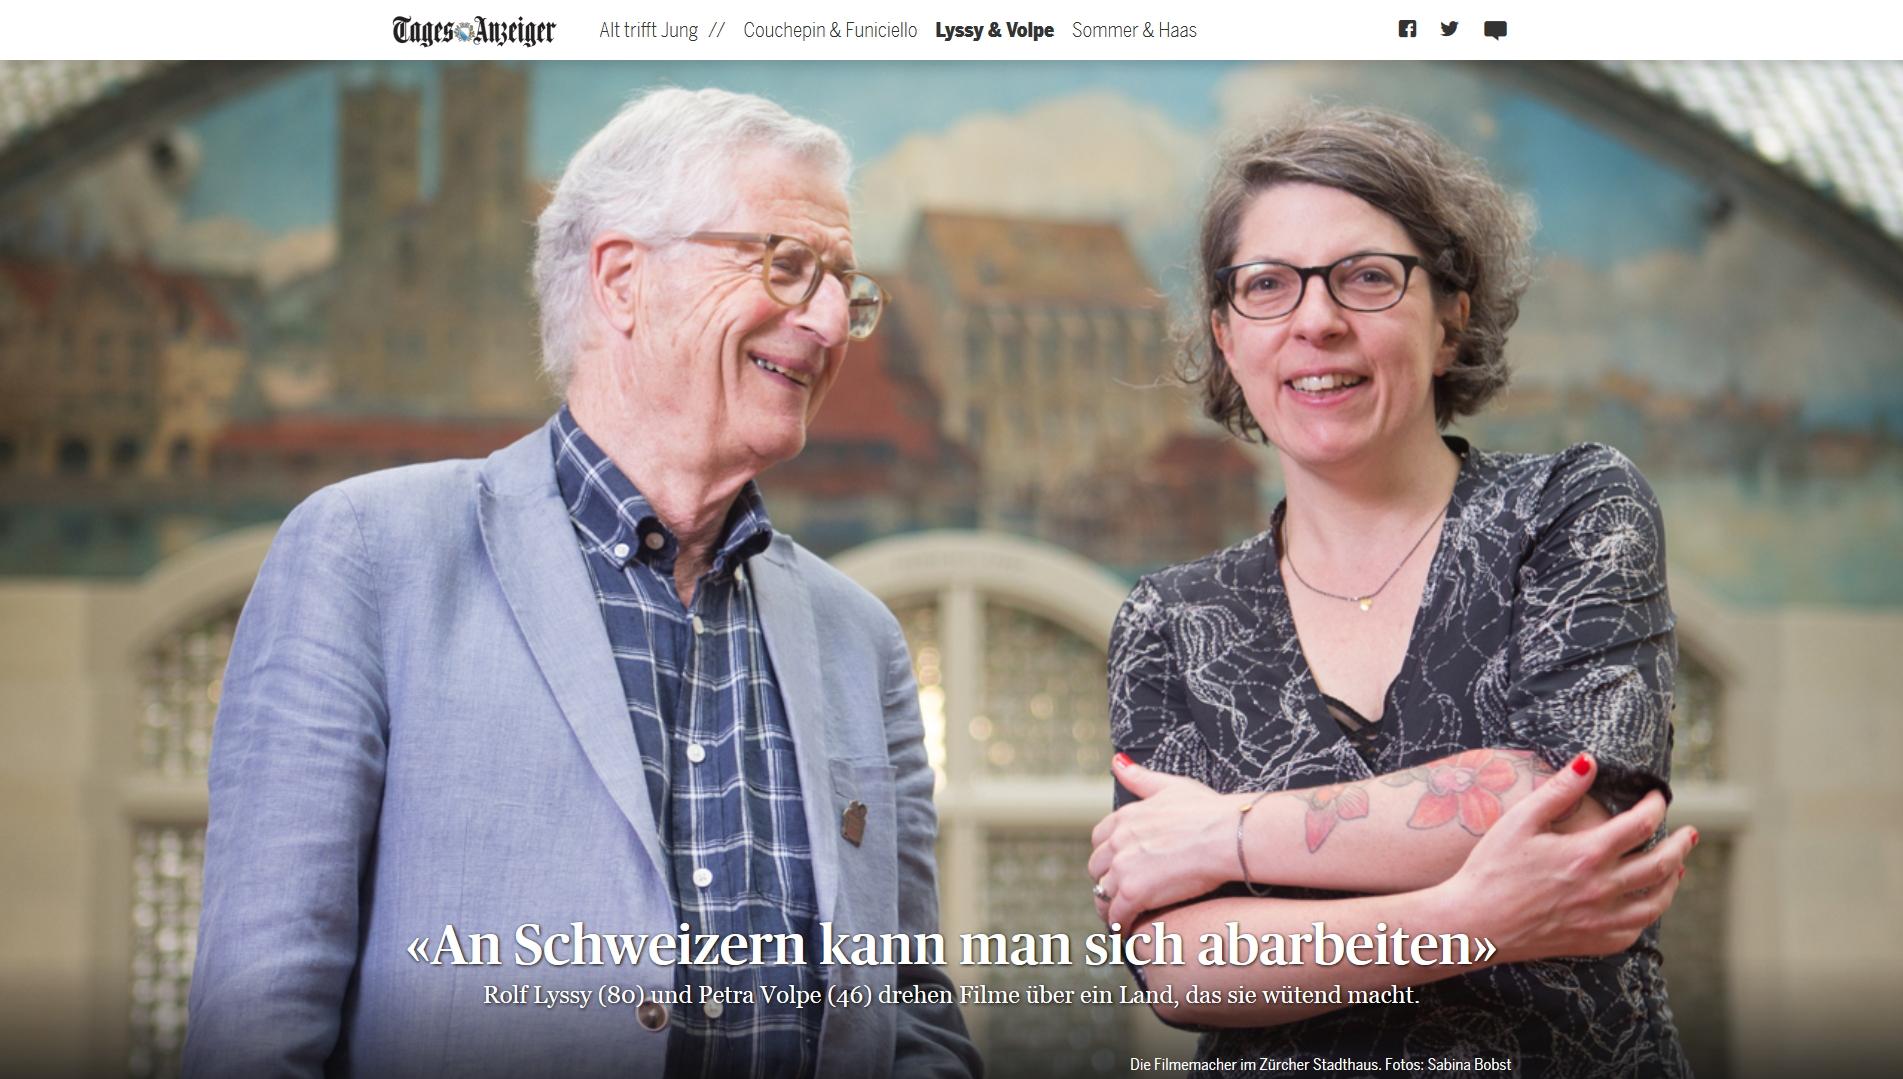 Rolf Lyssy und Petra Volpe